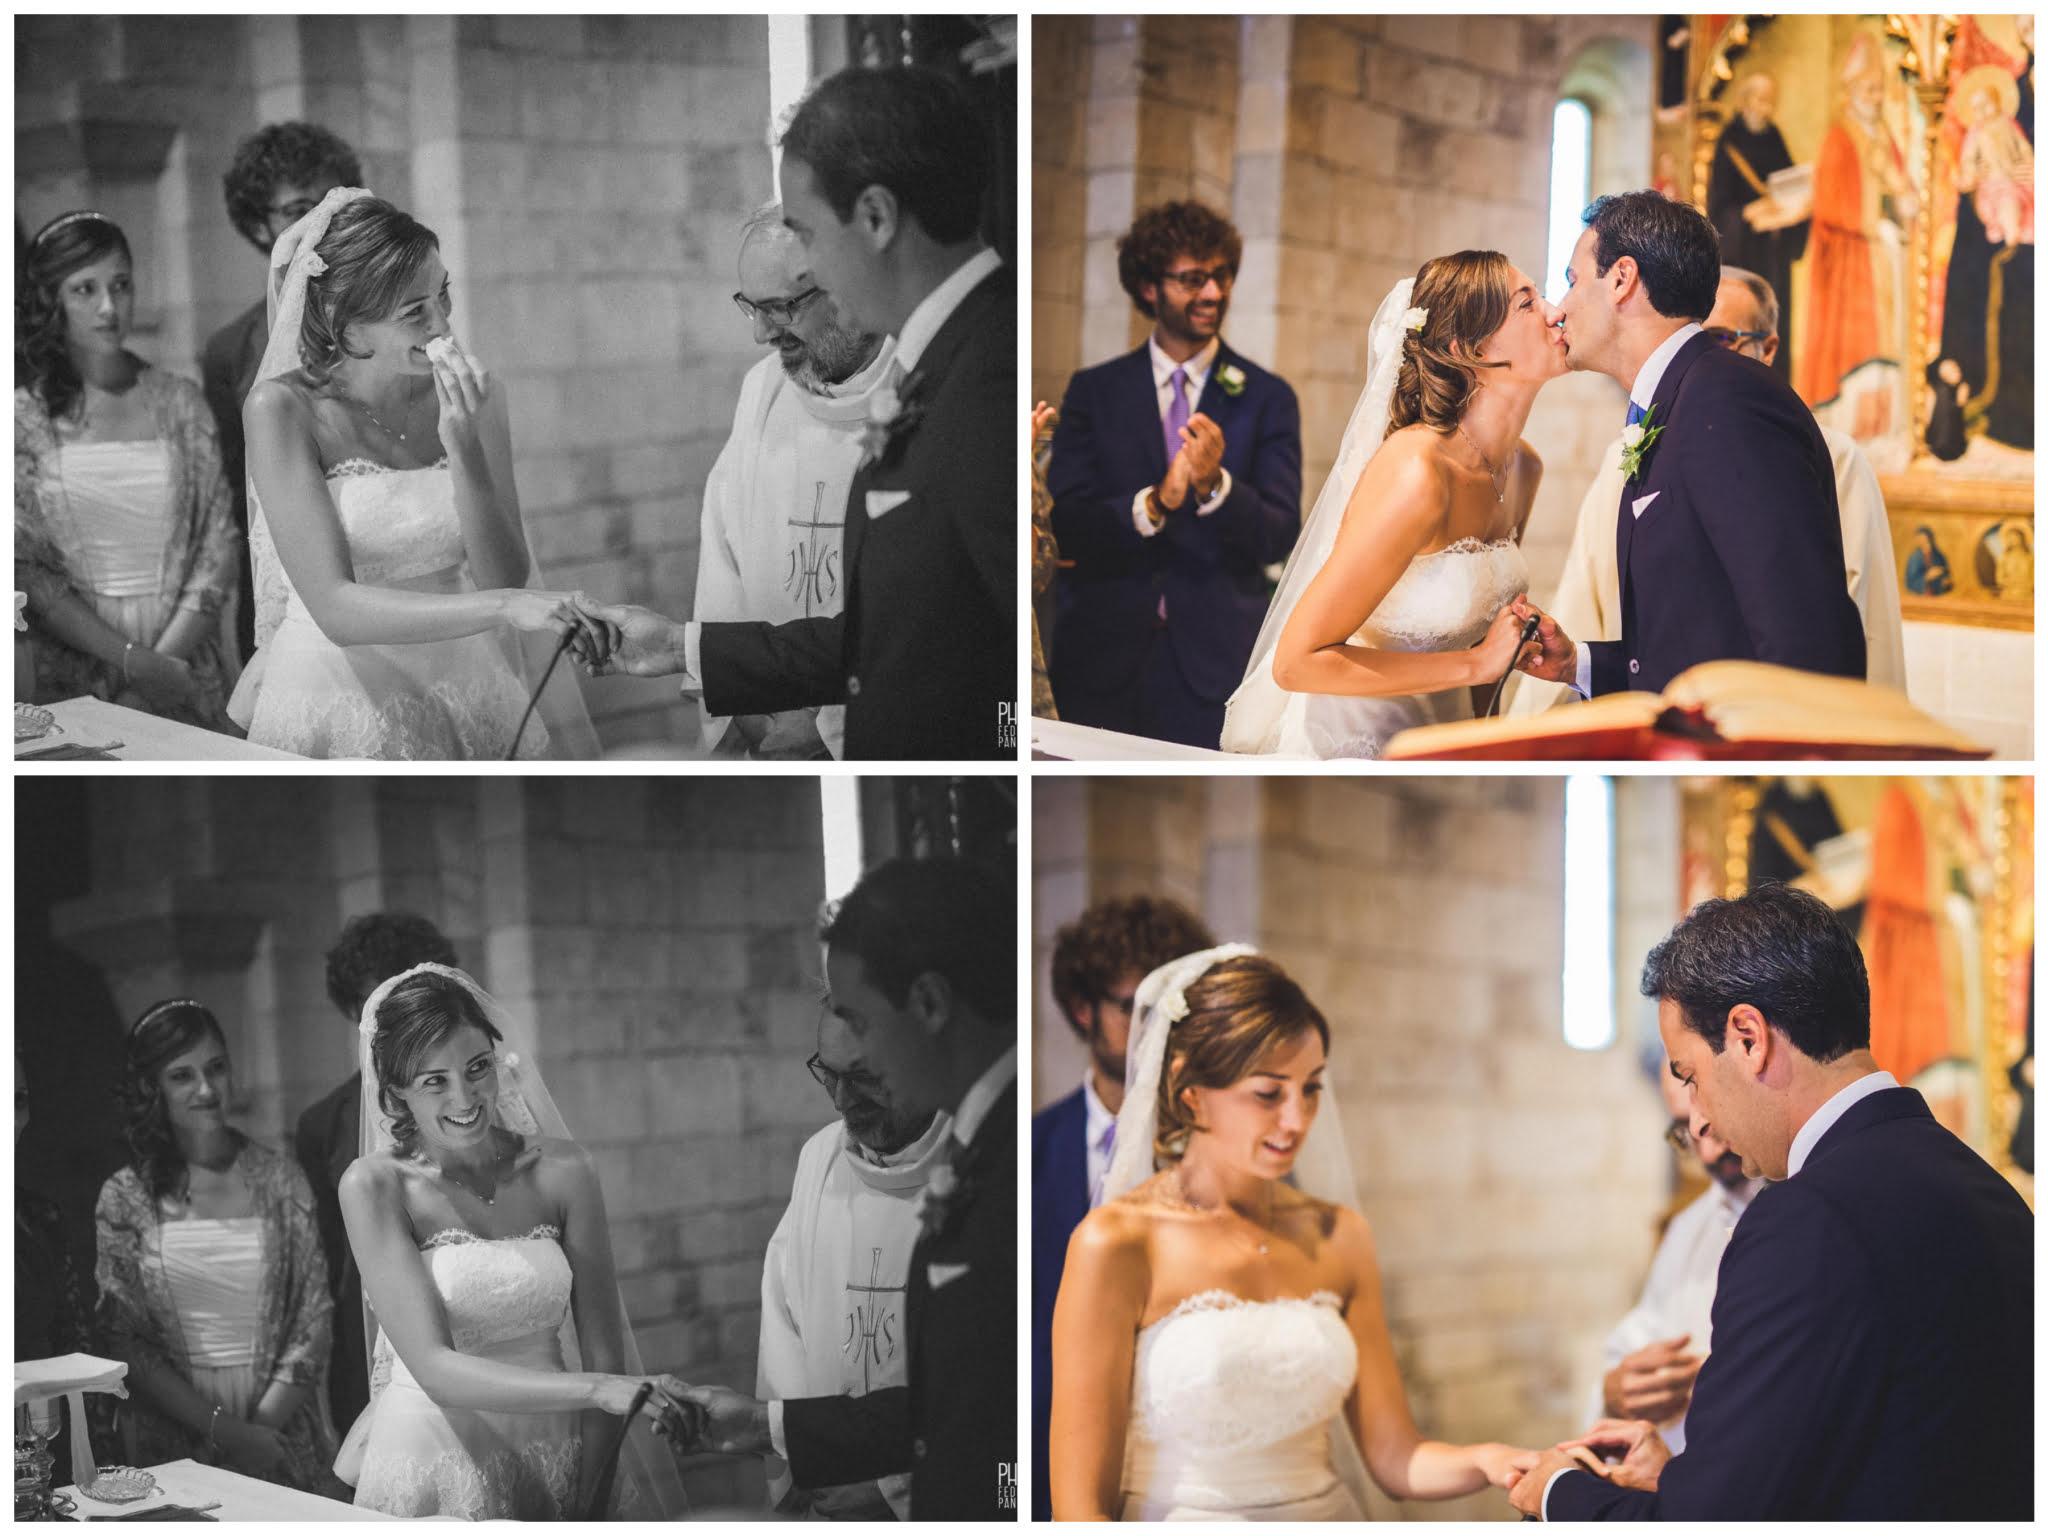 fotografo matrimonio siena-6_Fotor_Collage